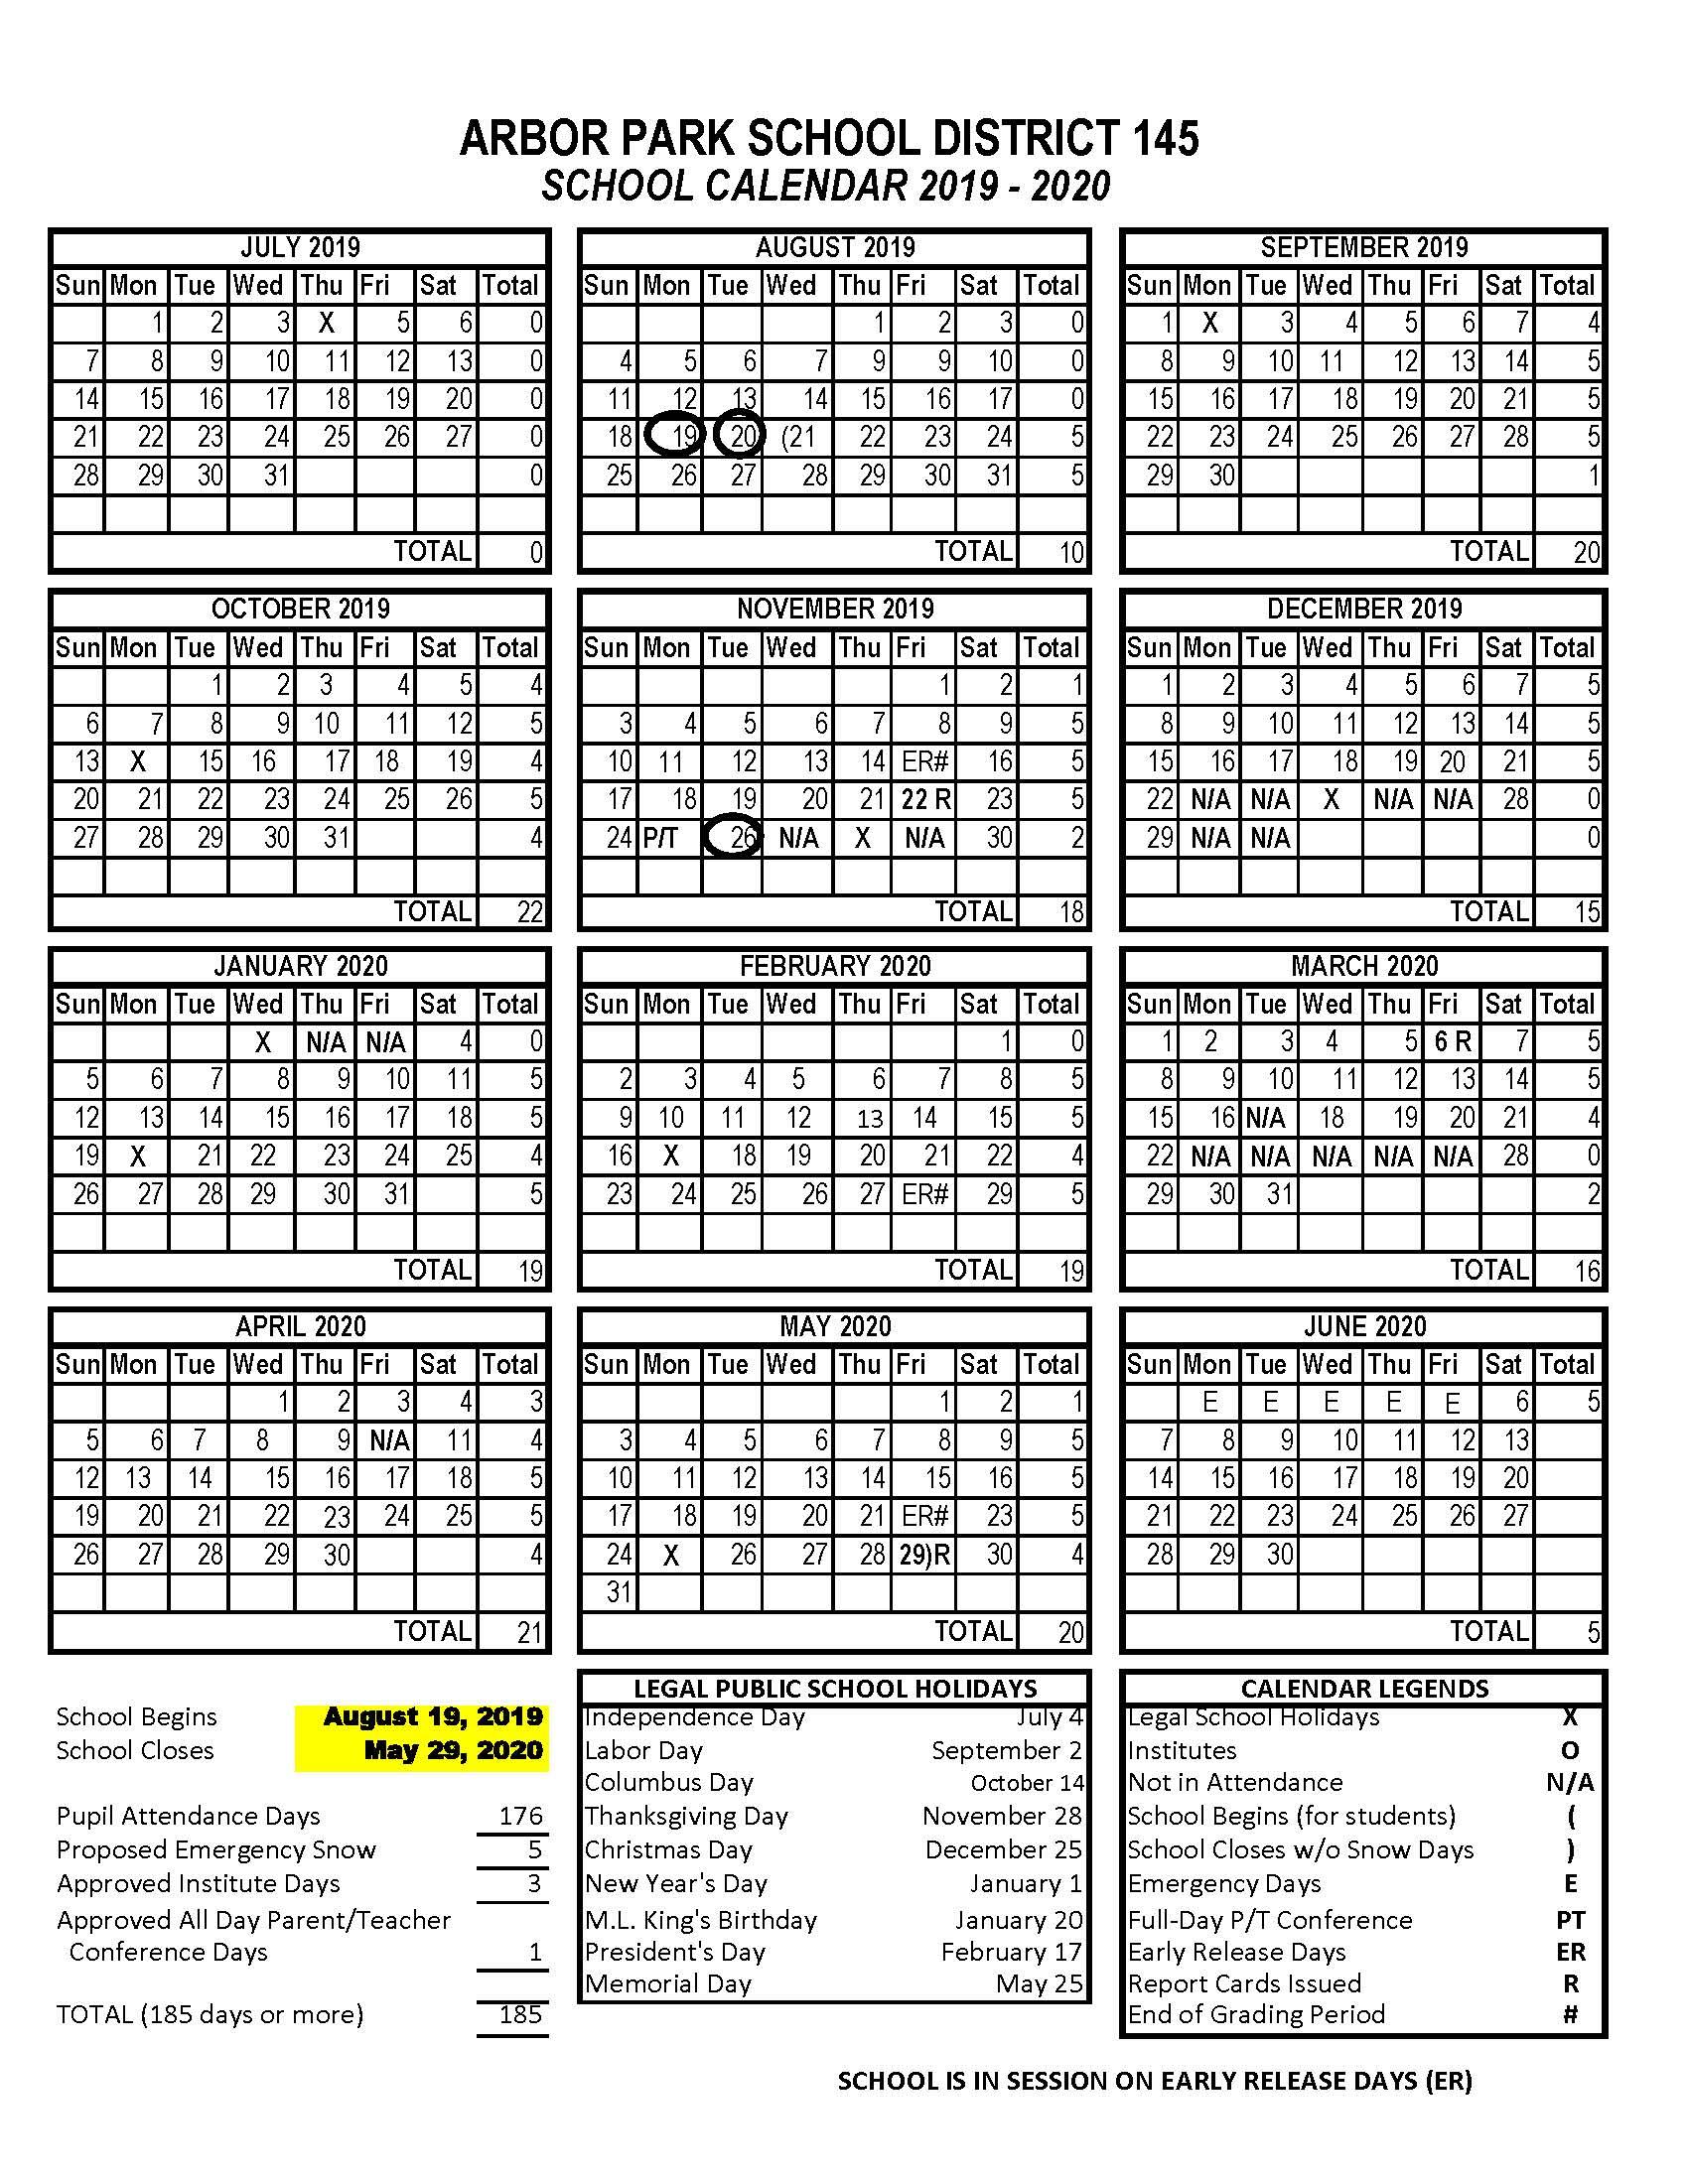 School Calendar In St Charles Illinois School Calendar